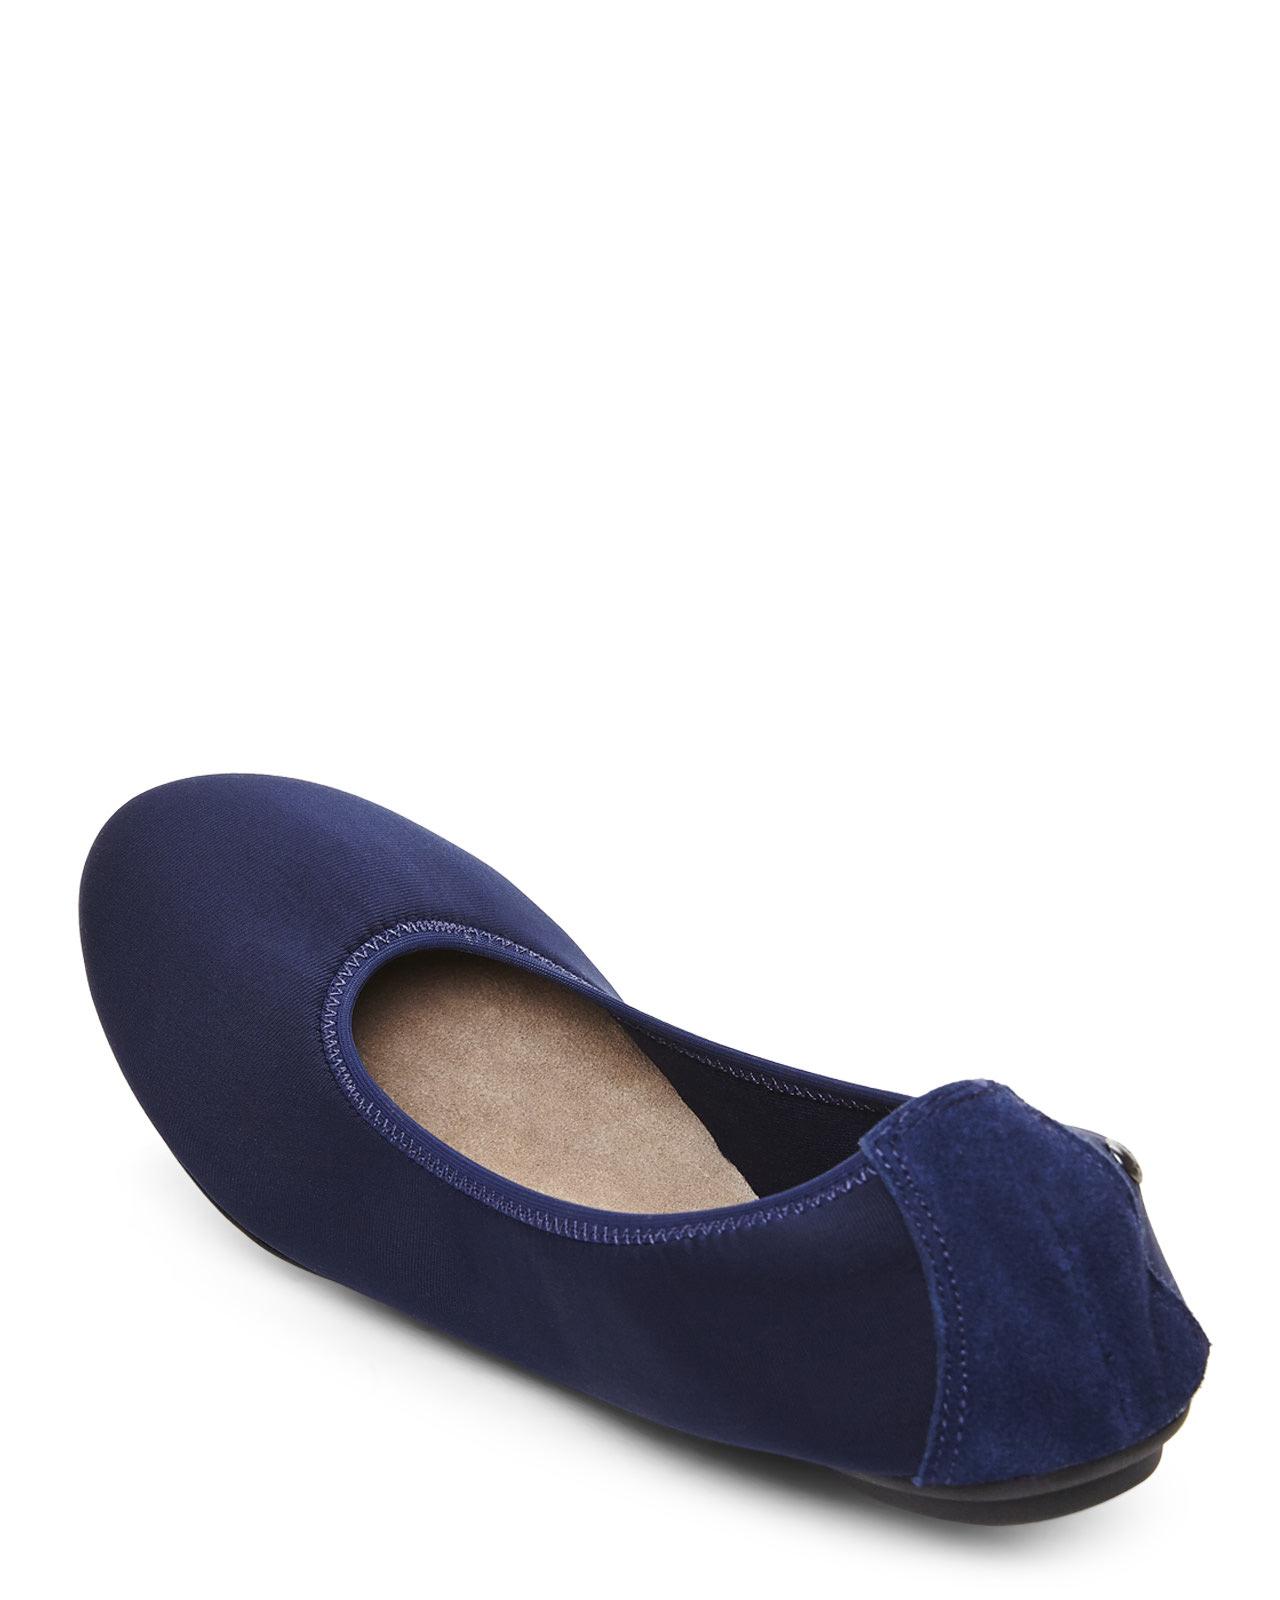 9e0616b11c9 Lyst - Hush Puppies Navy Chaste Ballet Flats in Blue